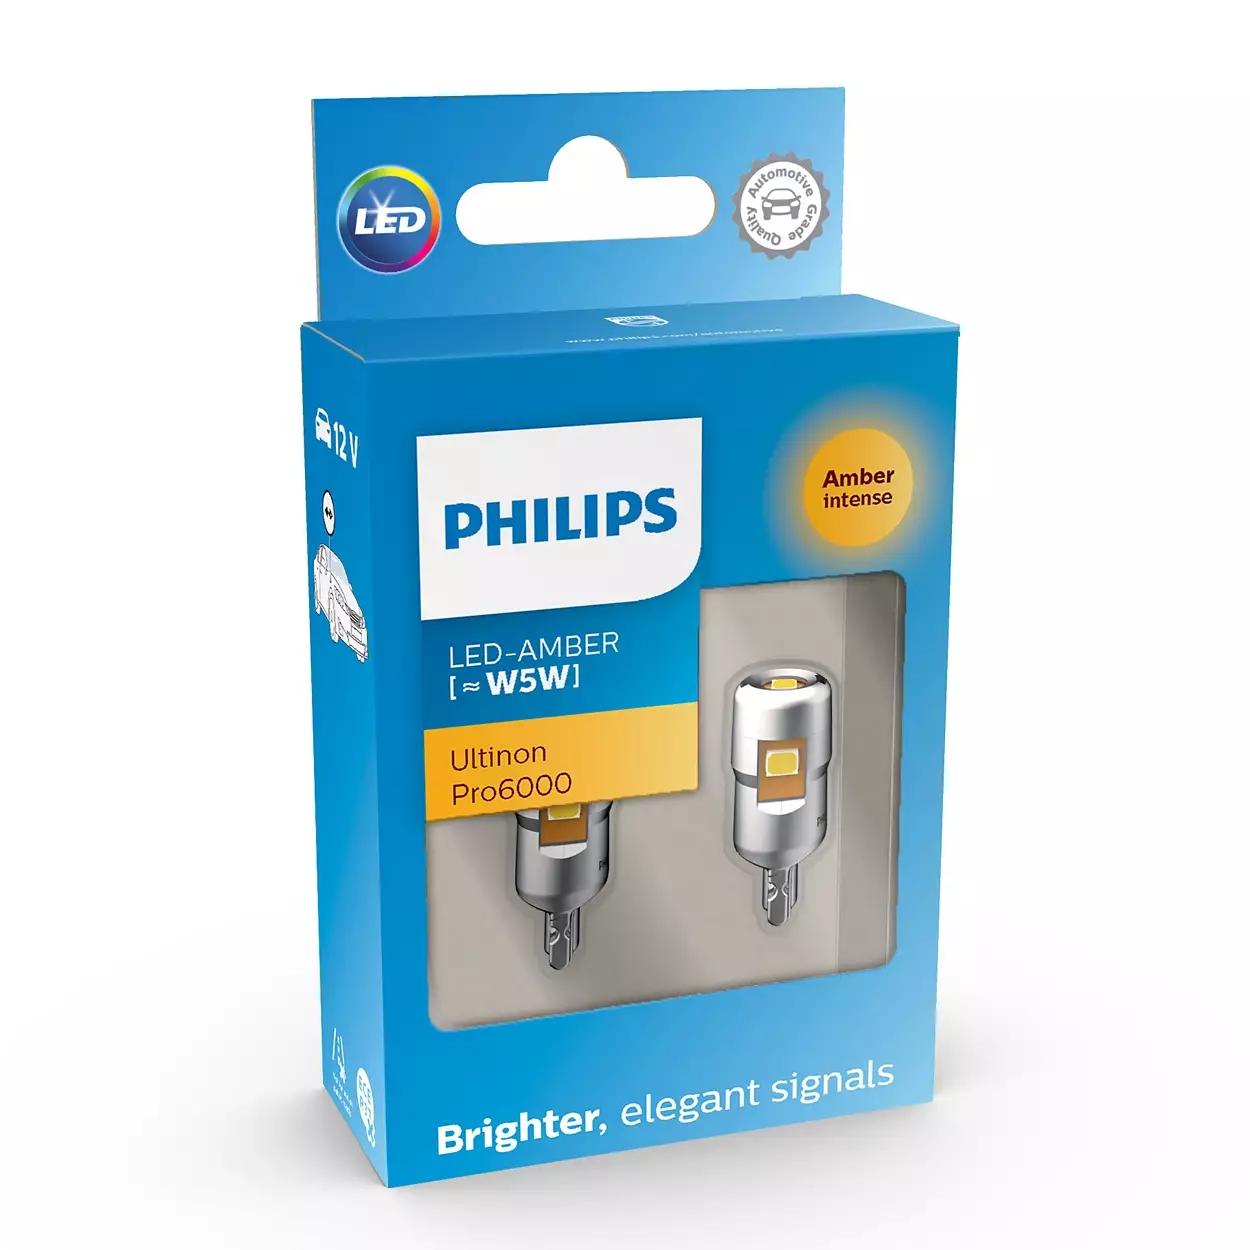 LED W5W 12V 0,5W Ultinon Pro6000 SI Amber Intense ...